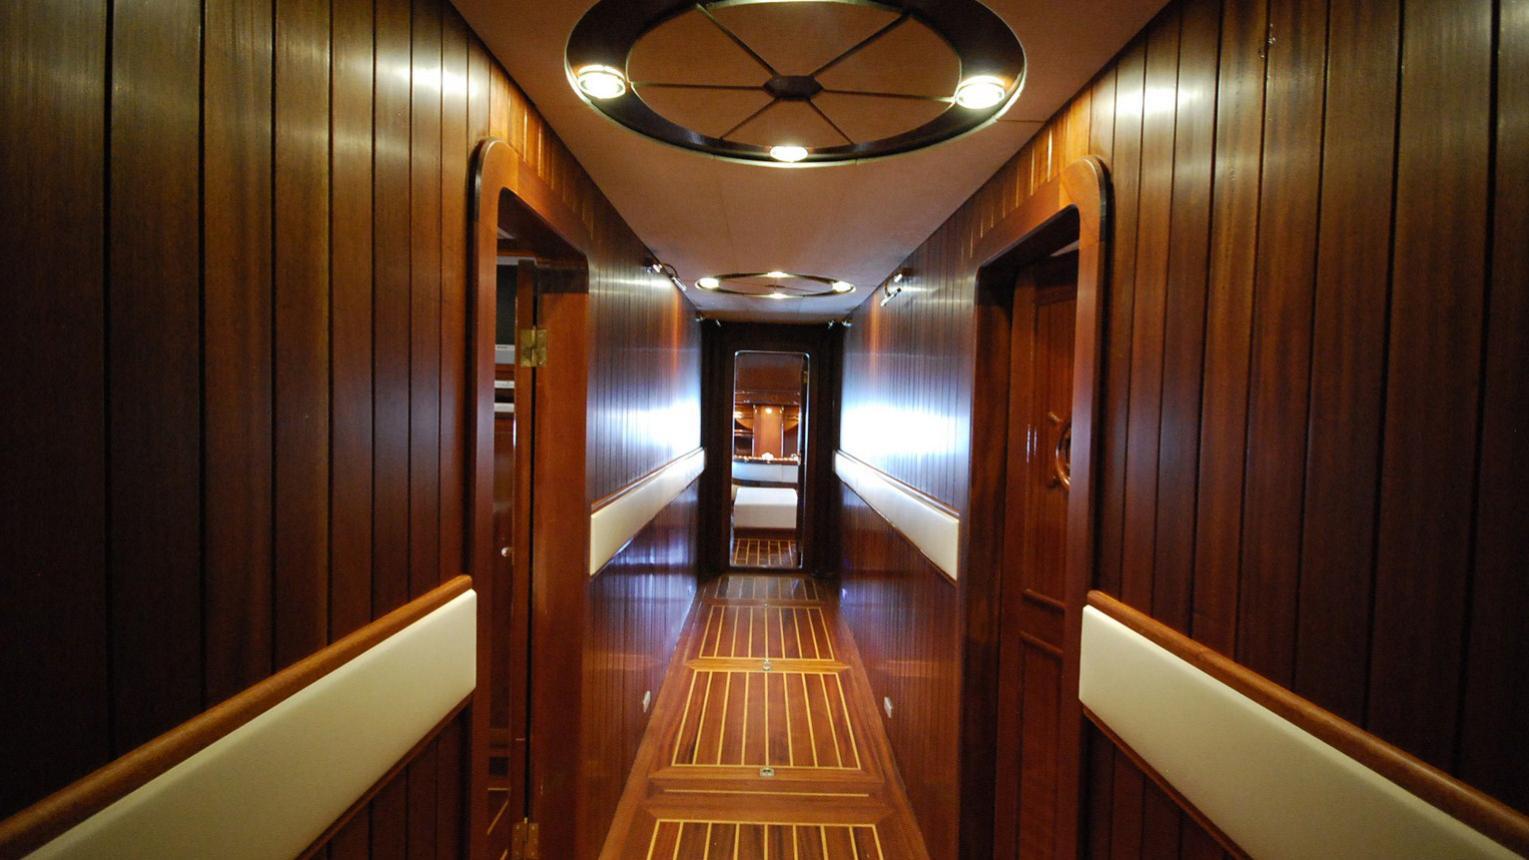 esma-sultan-yacht-hallway